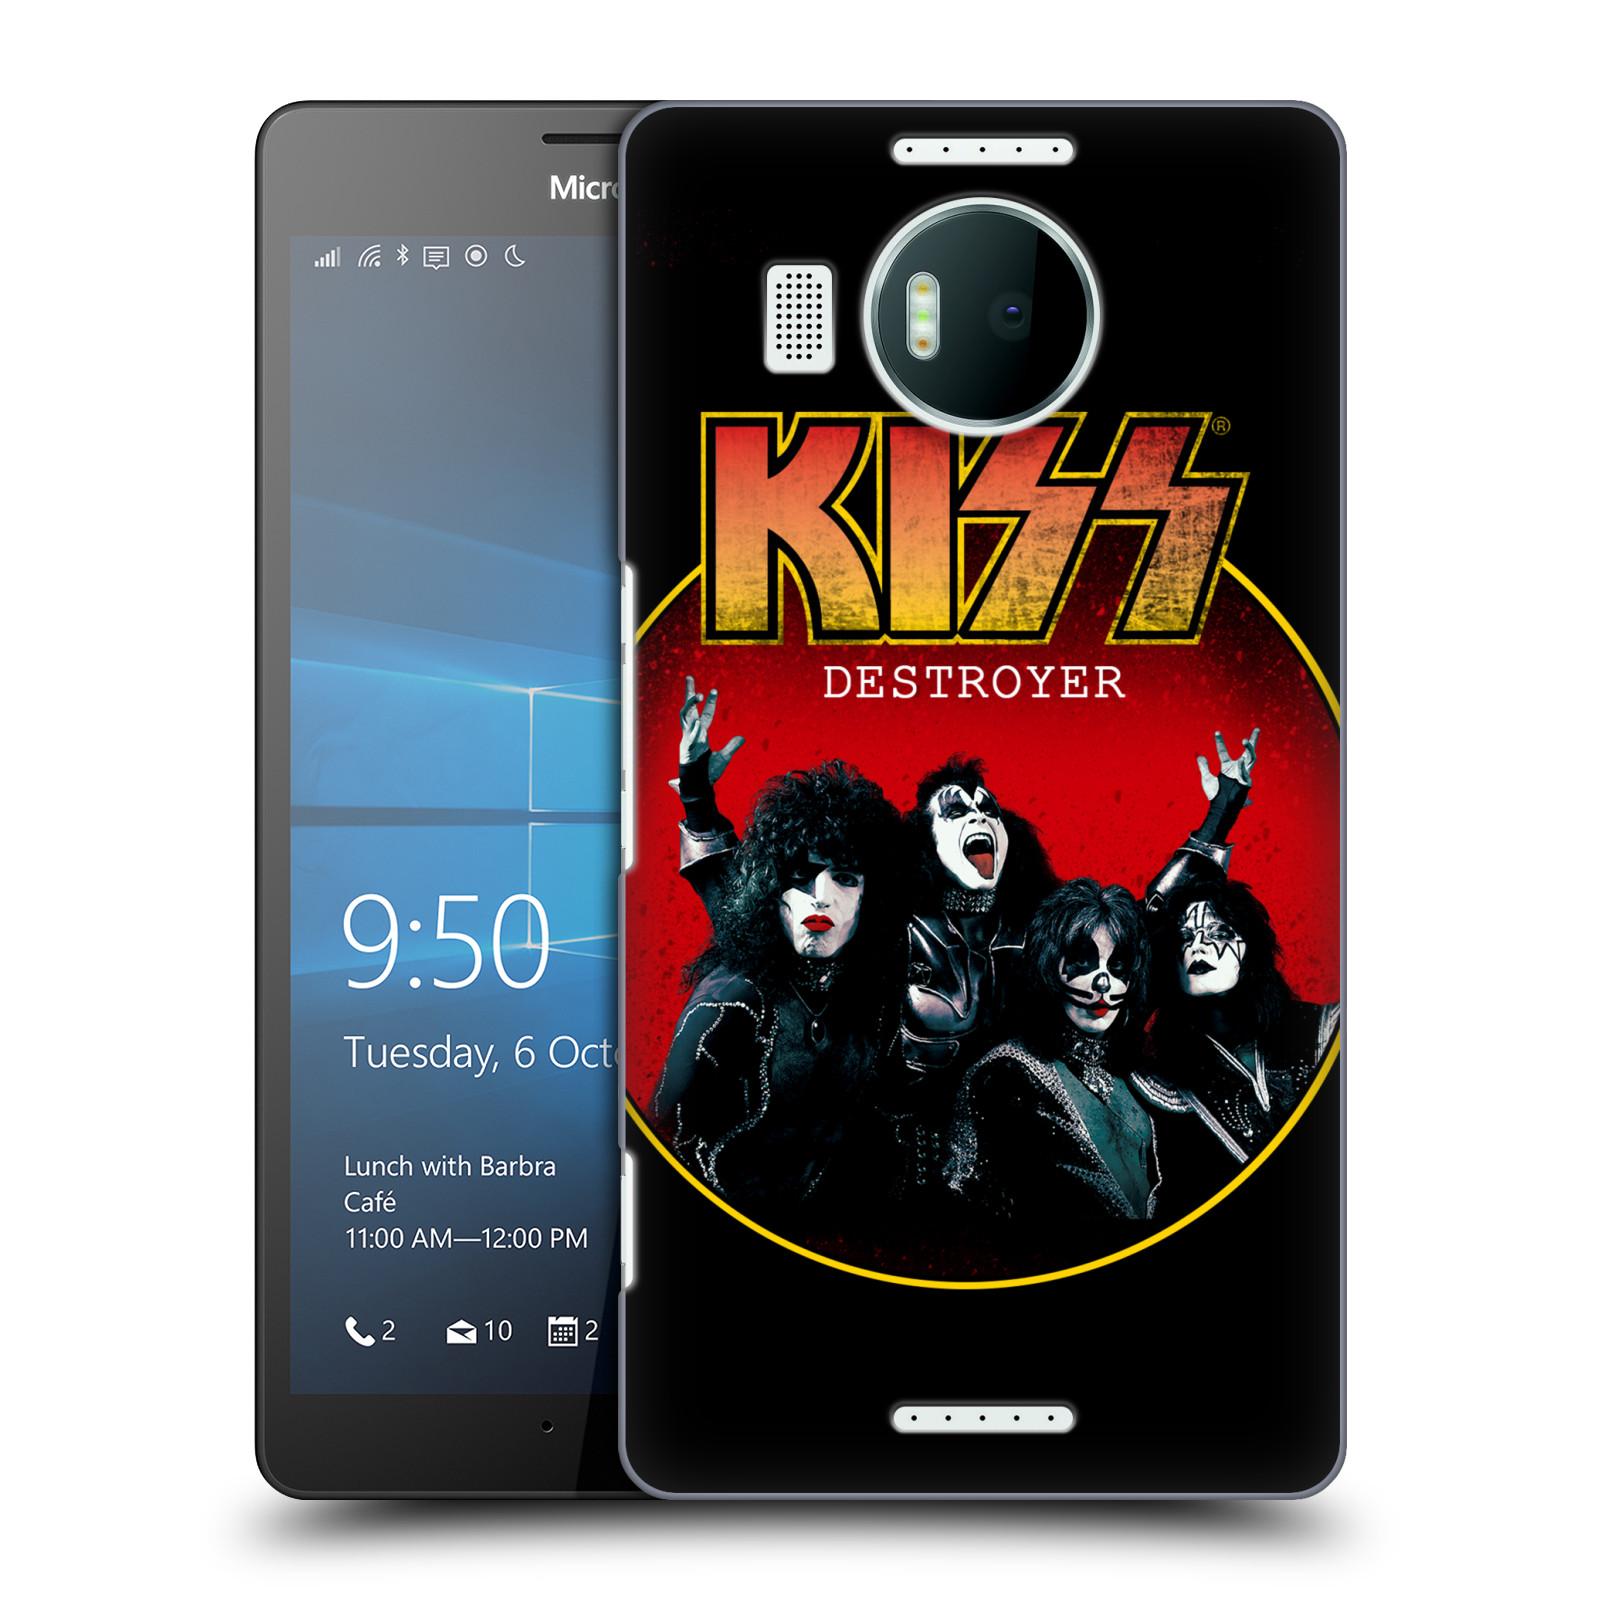 Plastové pouzdro na mobil Microsoft Lumia 950 XL HEAD CASE - Kiss - Destroyer